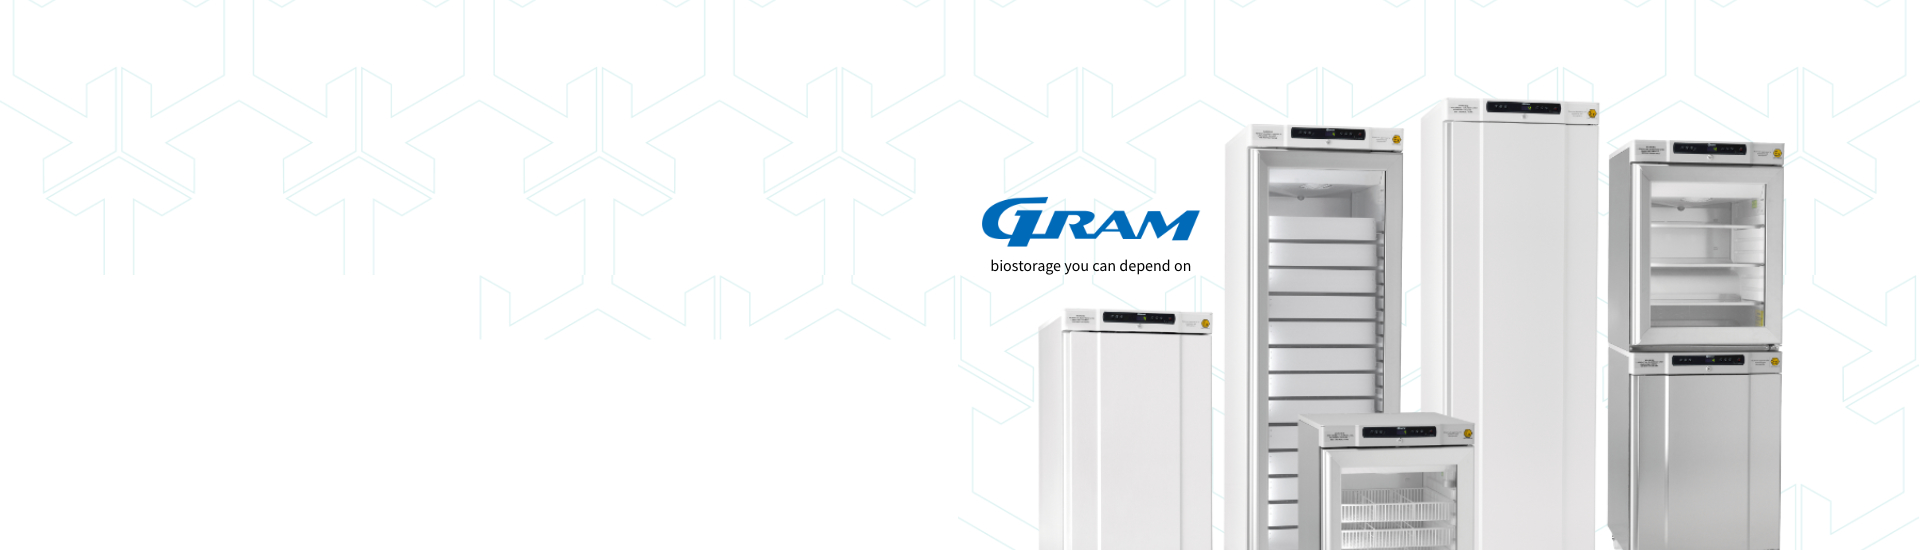 Gram bioline configurator img